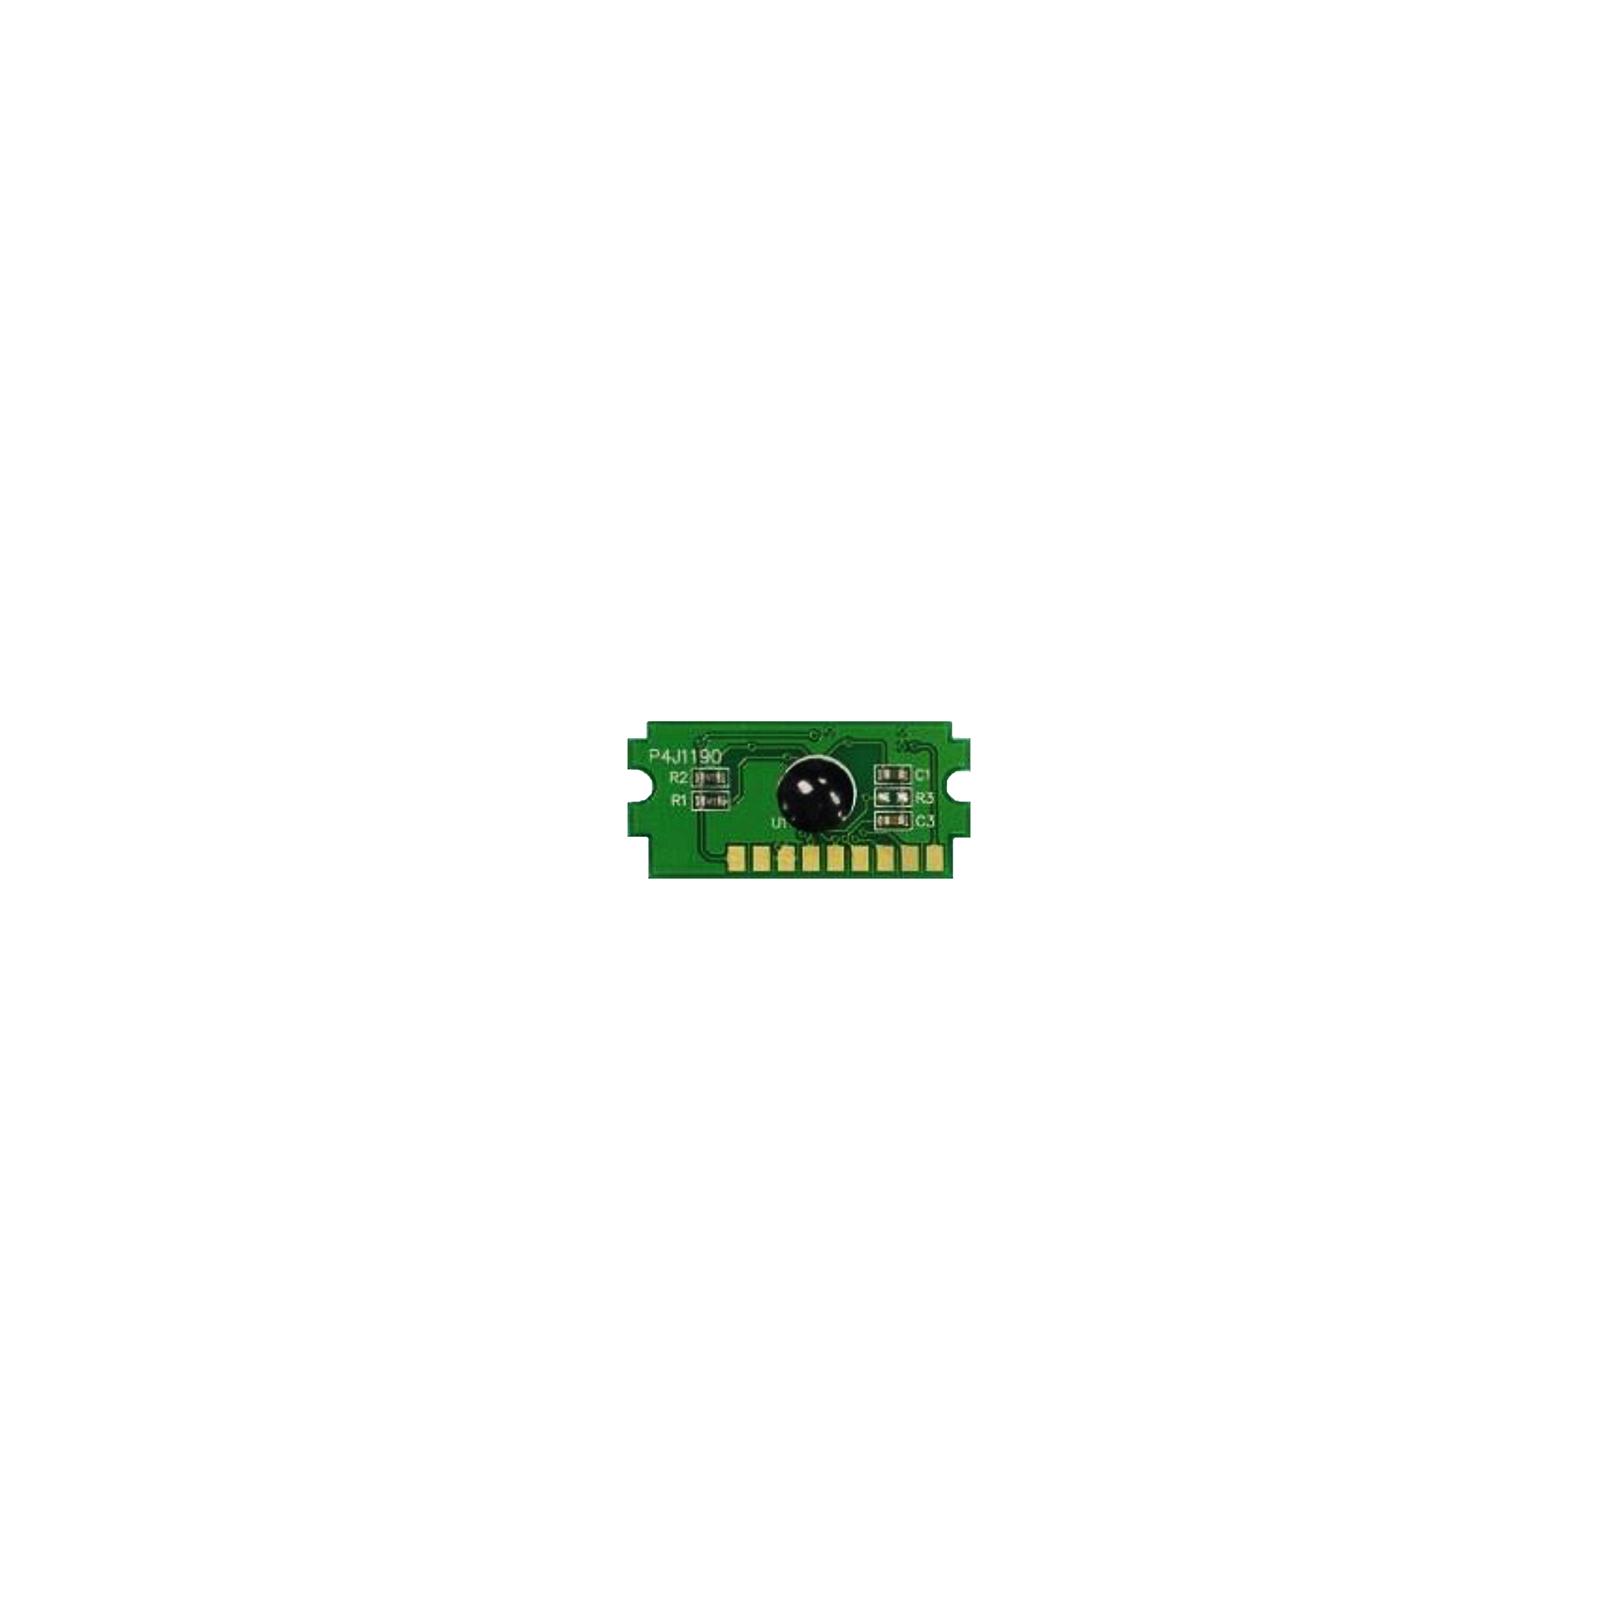 Чип для картриджа Kyocera TK-5140K (EU) 7k black Static Control (TK5140CP-KEU)